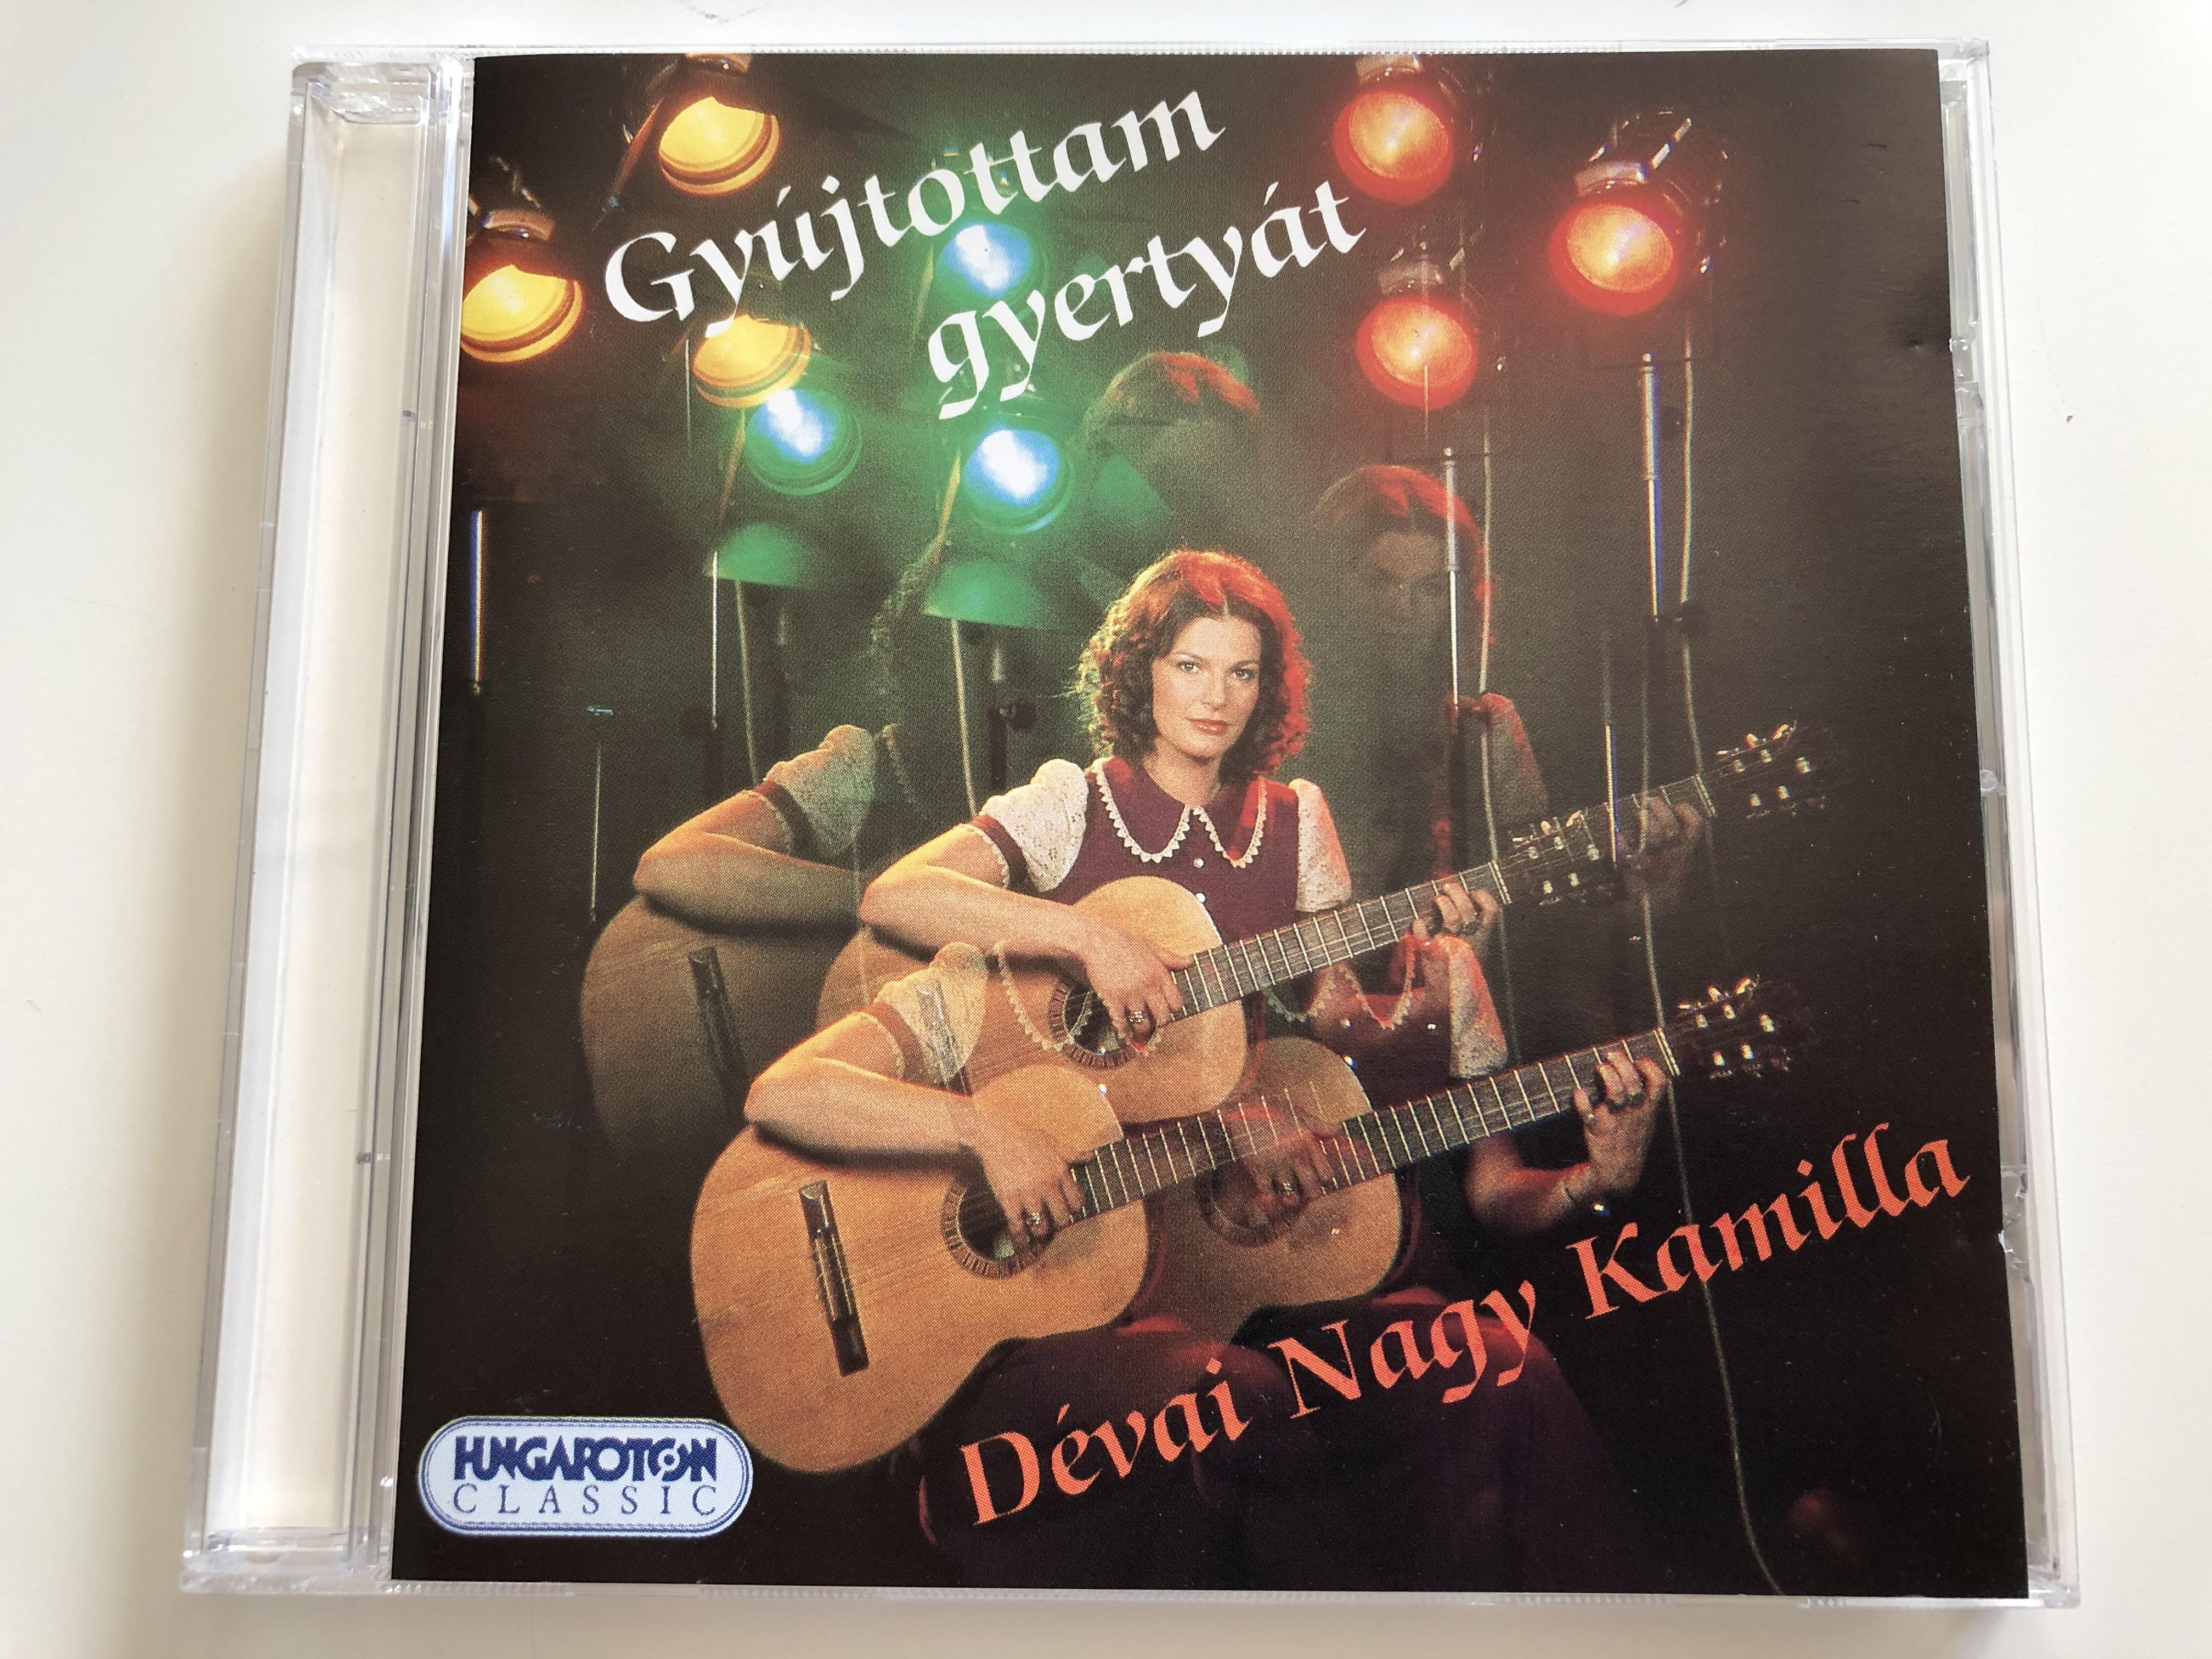 gy-jtottam-gyerty-t-d-vai-nagy-kamilla-hungaroton-classic-audio-cd-1994-stereo-hcd-18054-1-.jpg